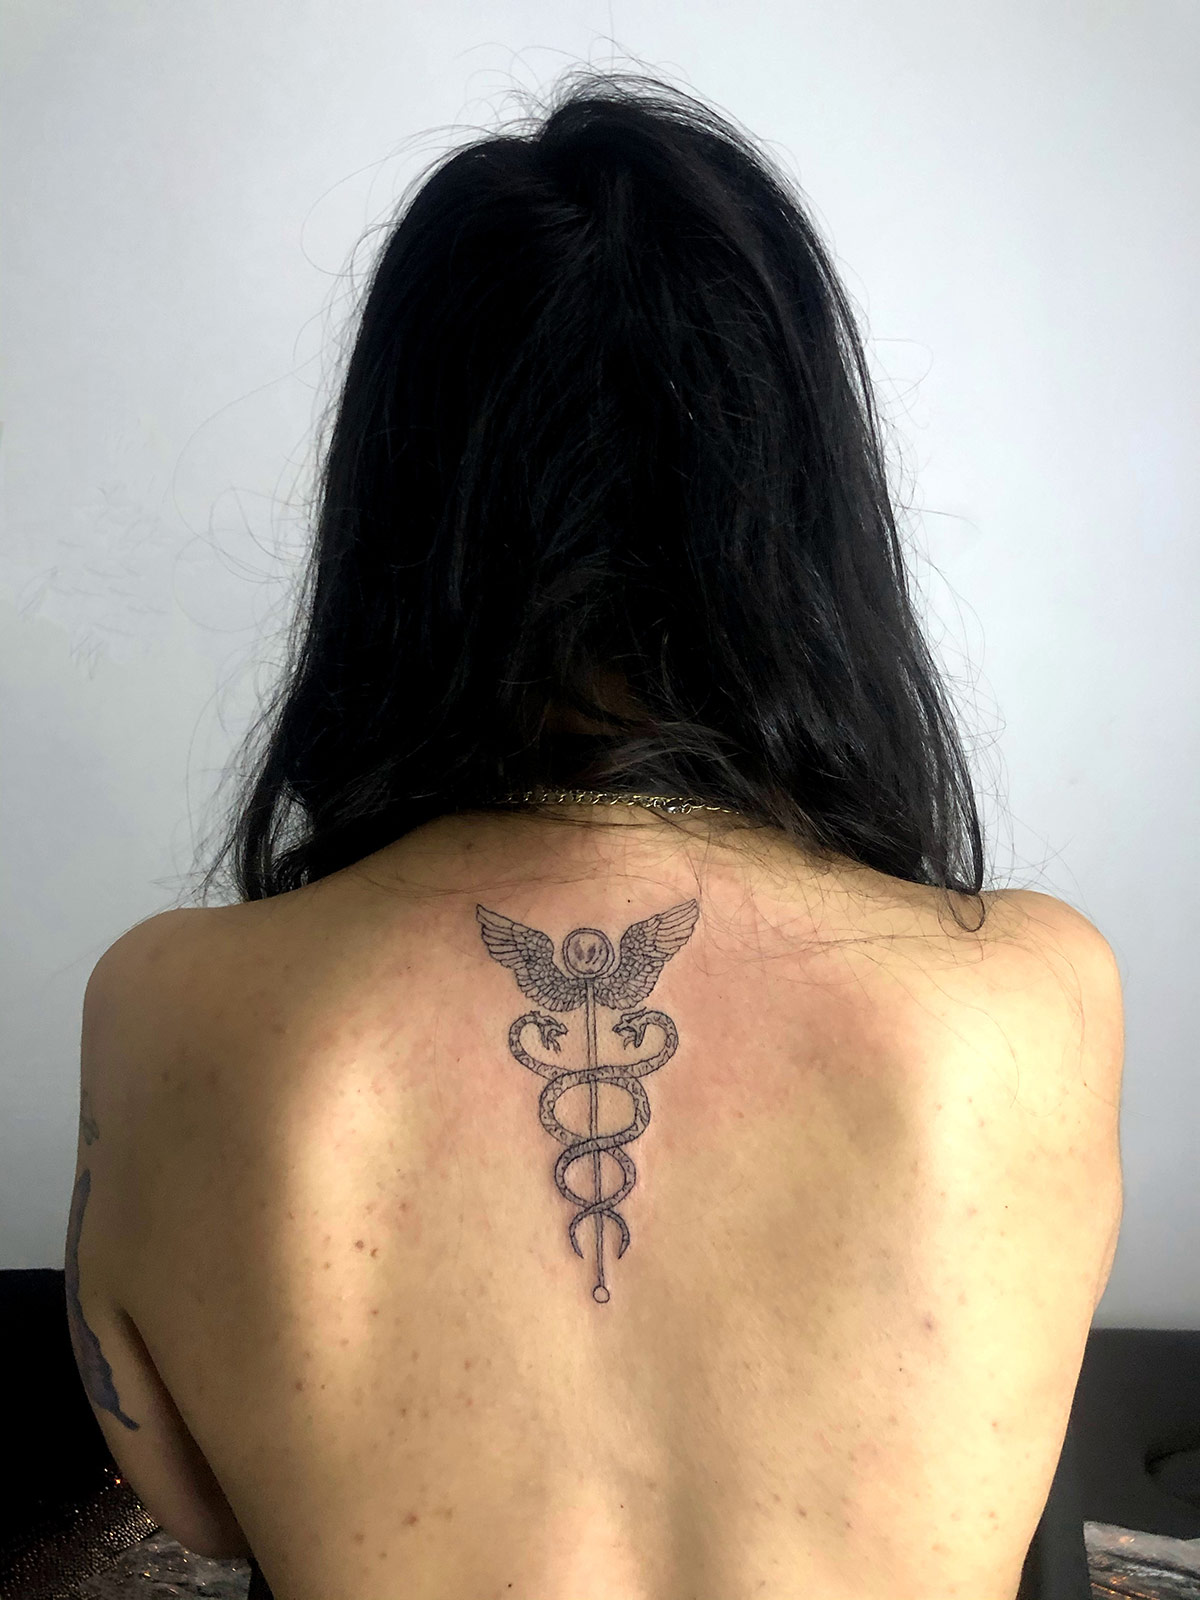 666 tattoo 15 Notorious